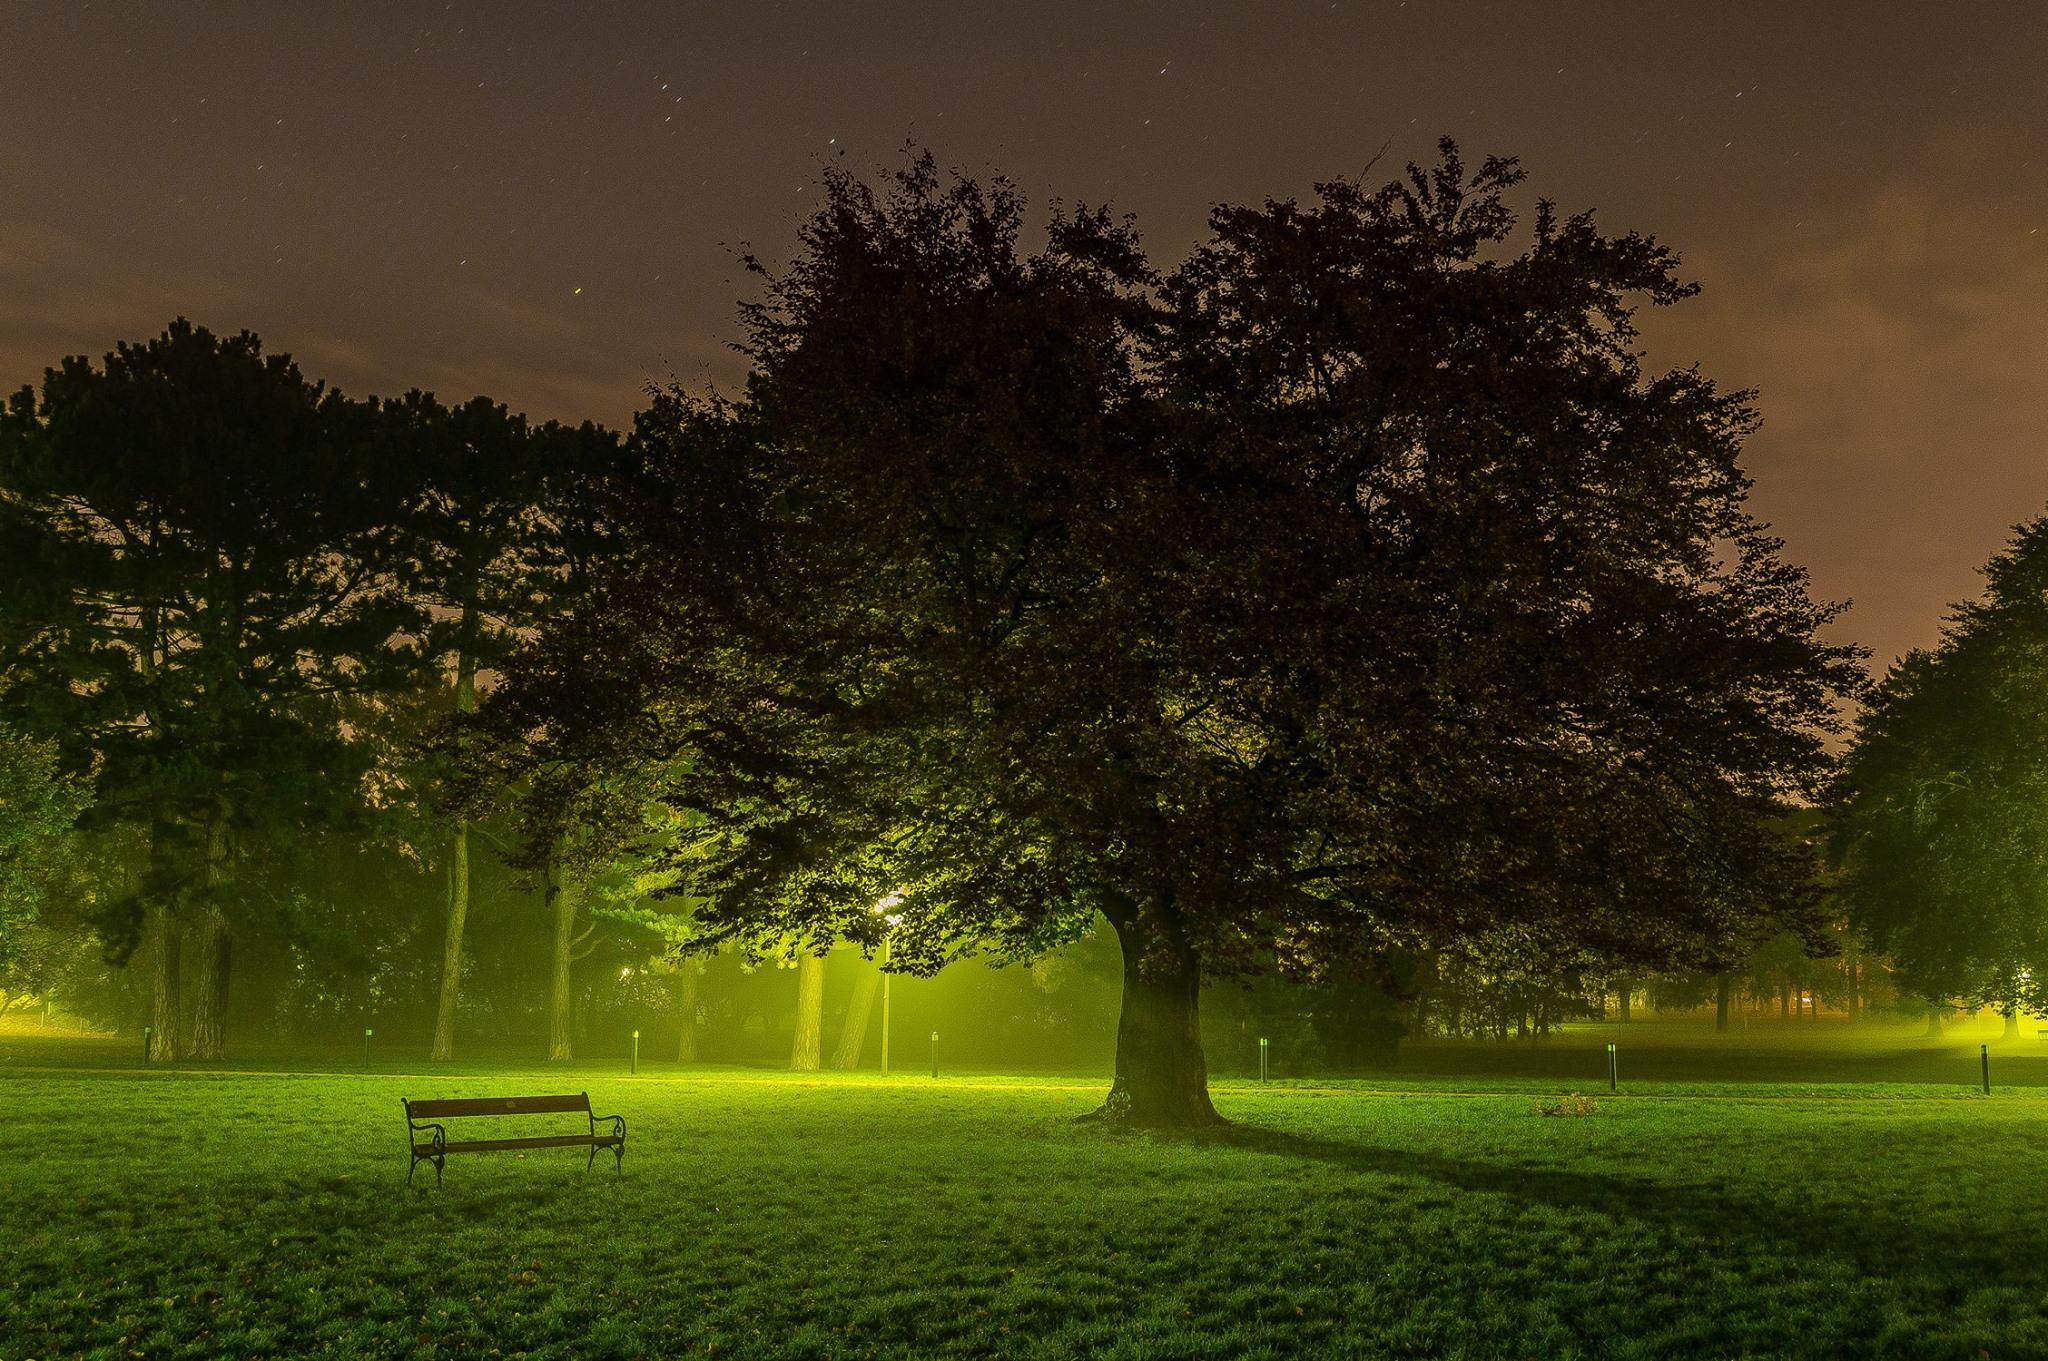 That light in the park, Austria